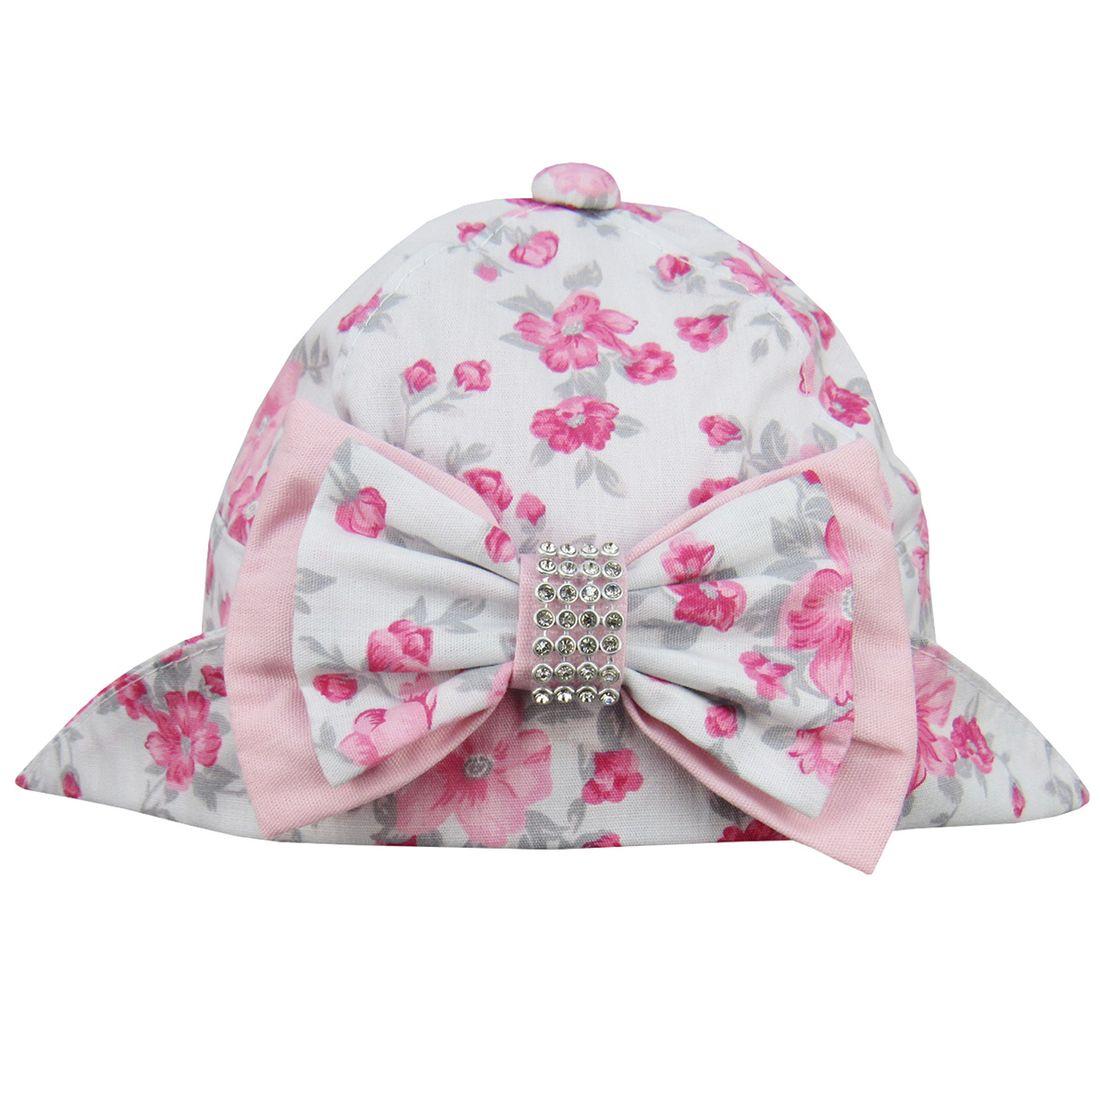 Chapéu Bebê Feminino Branco Floral - 5 à 8 Meses - poetique 151d2206934